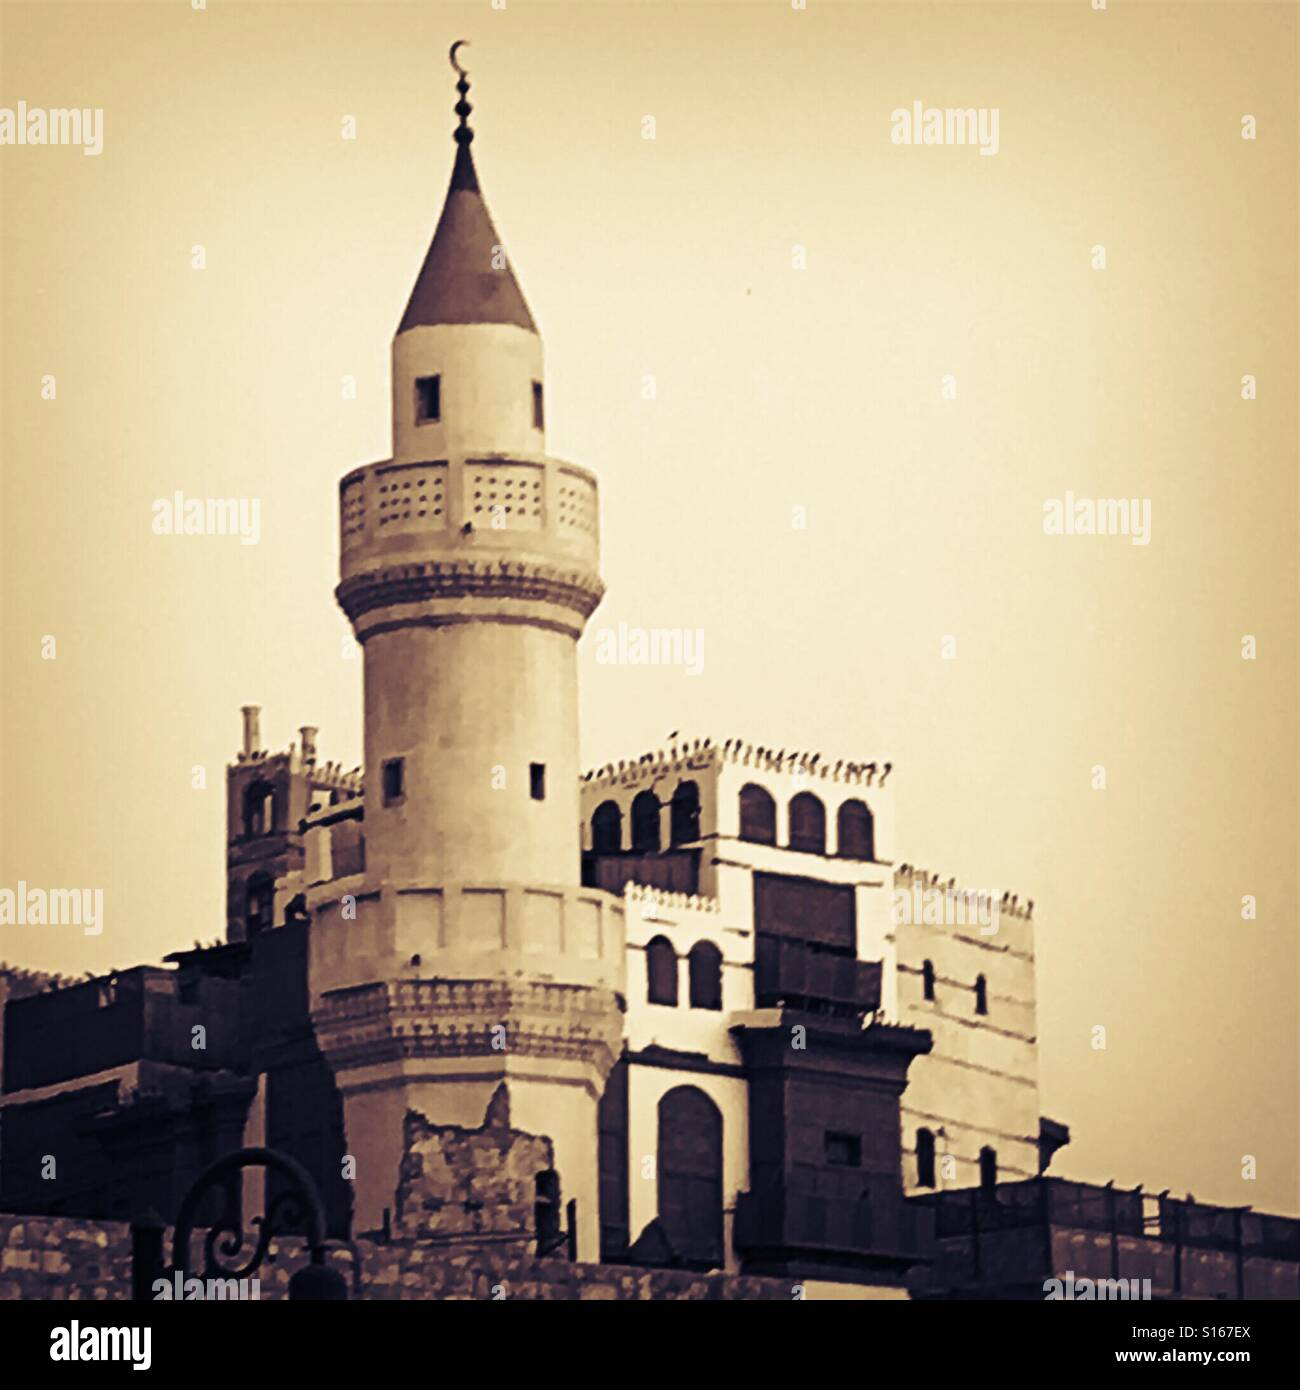 Mosque in Jeddah, Saudi Arabia in historic district - Stock Image